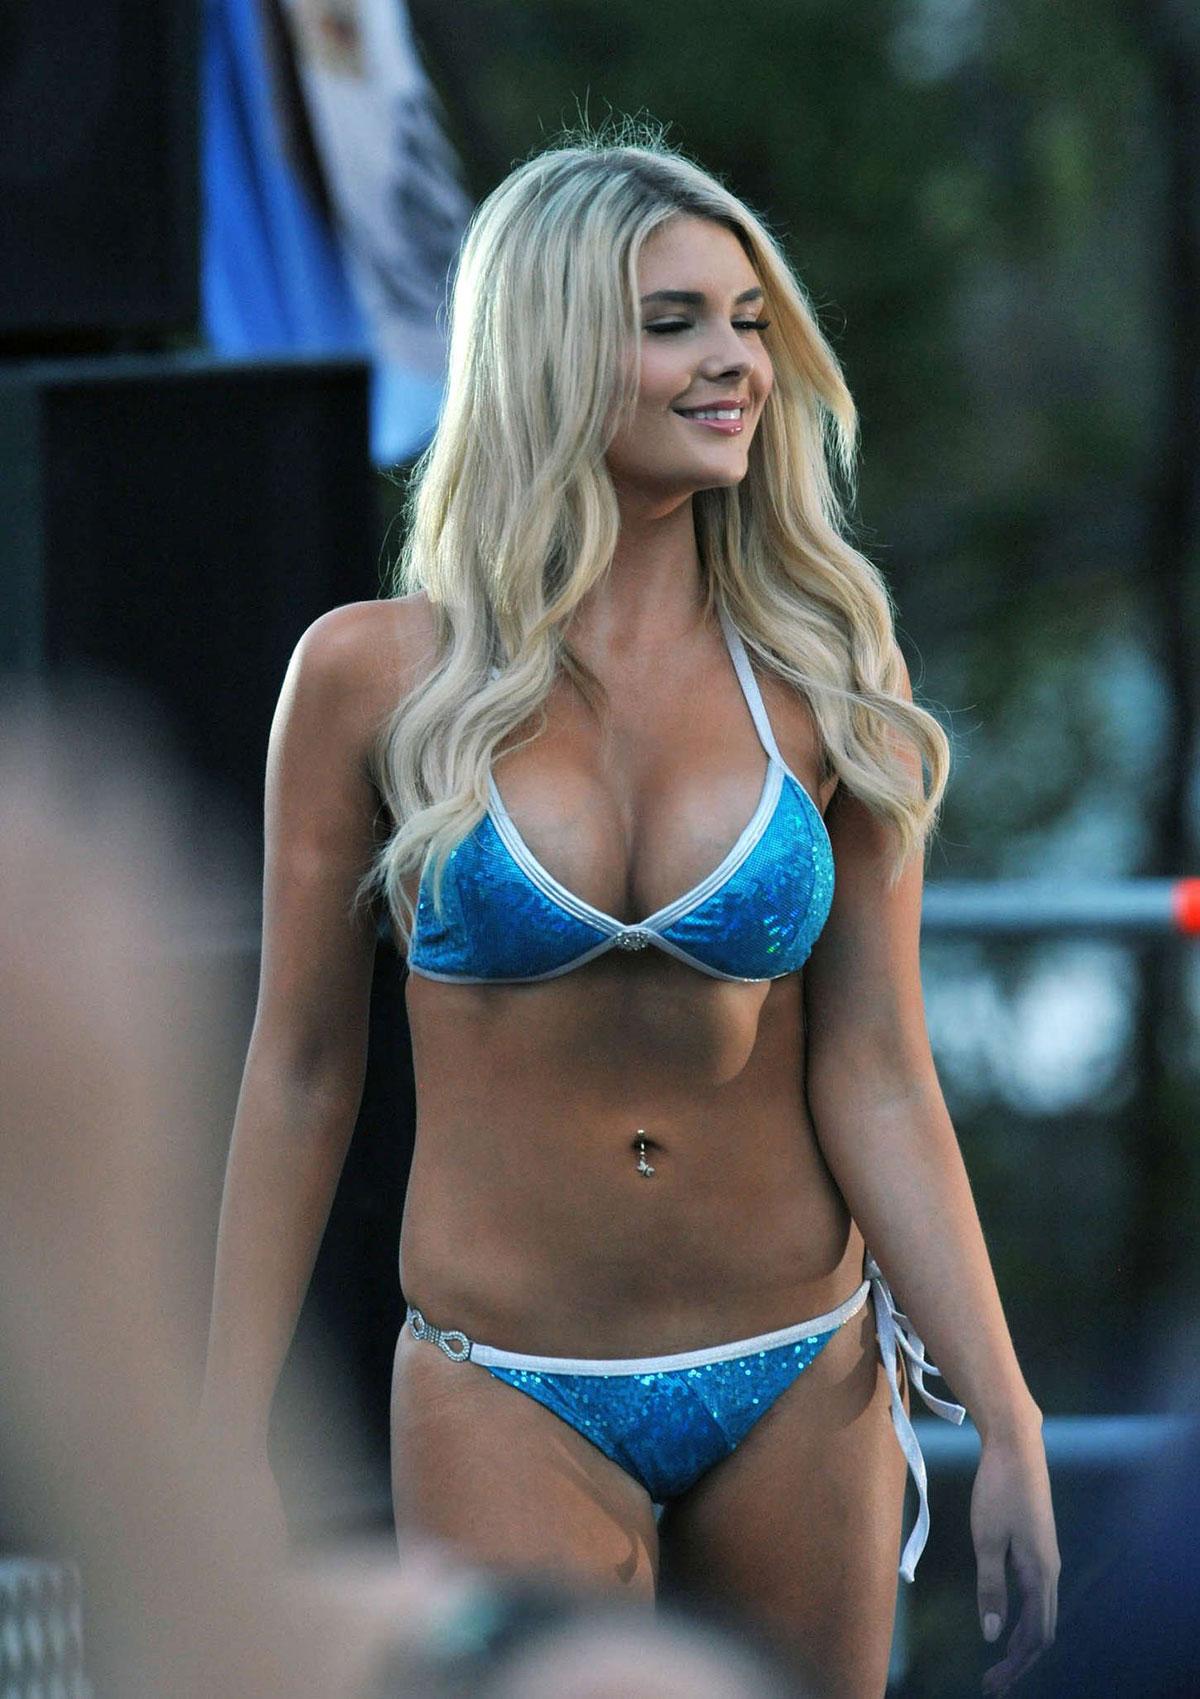 Miss V8 Supercar Bikini Competition - HawtCelebs - HawtCelebs